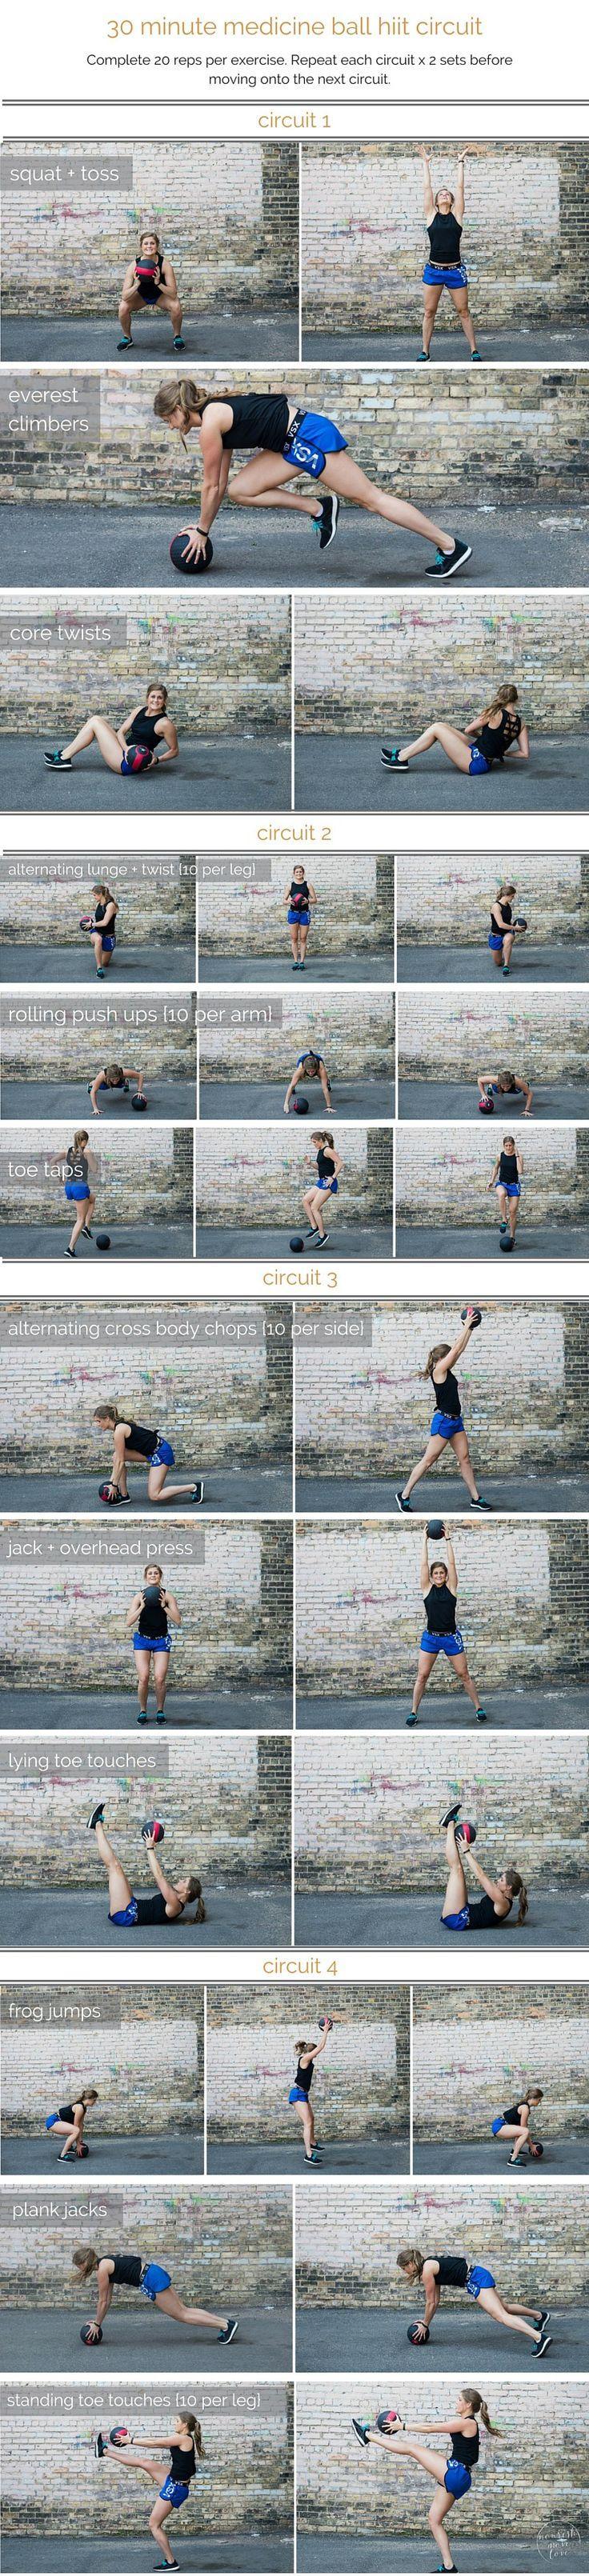 Wedding - Medicine Ball Hiit Circuit Workout